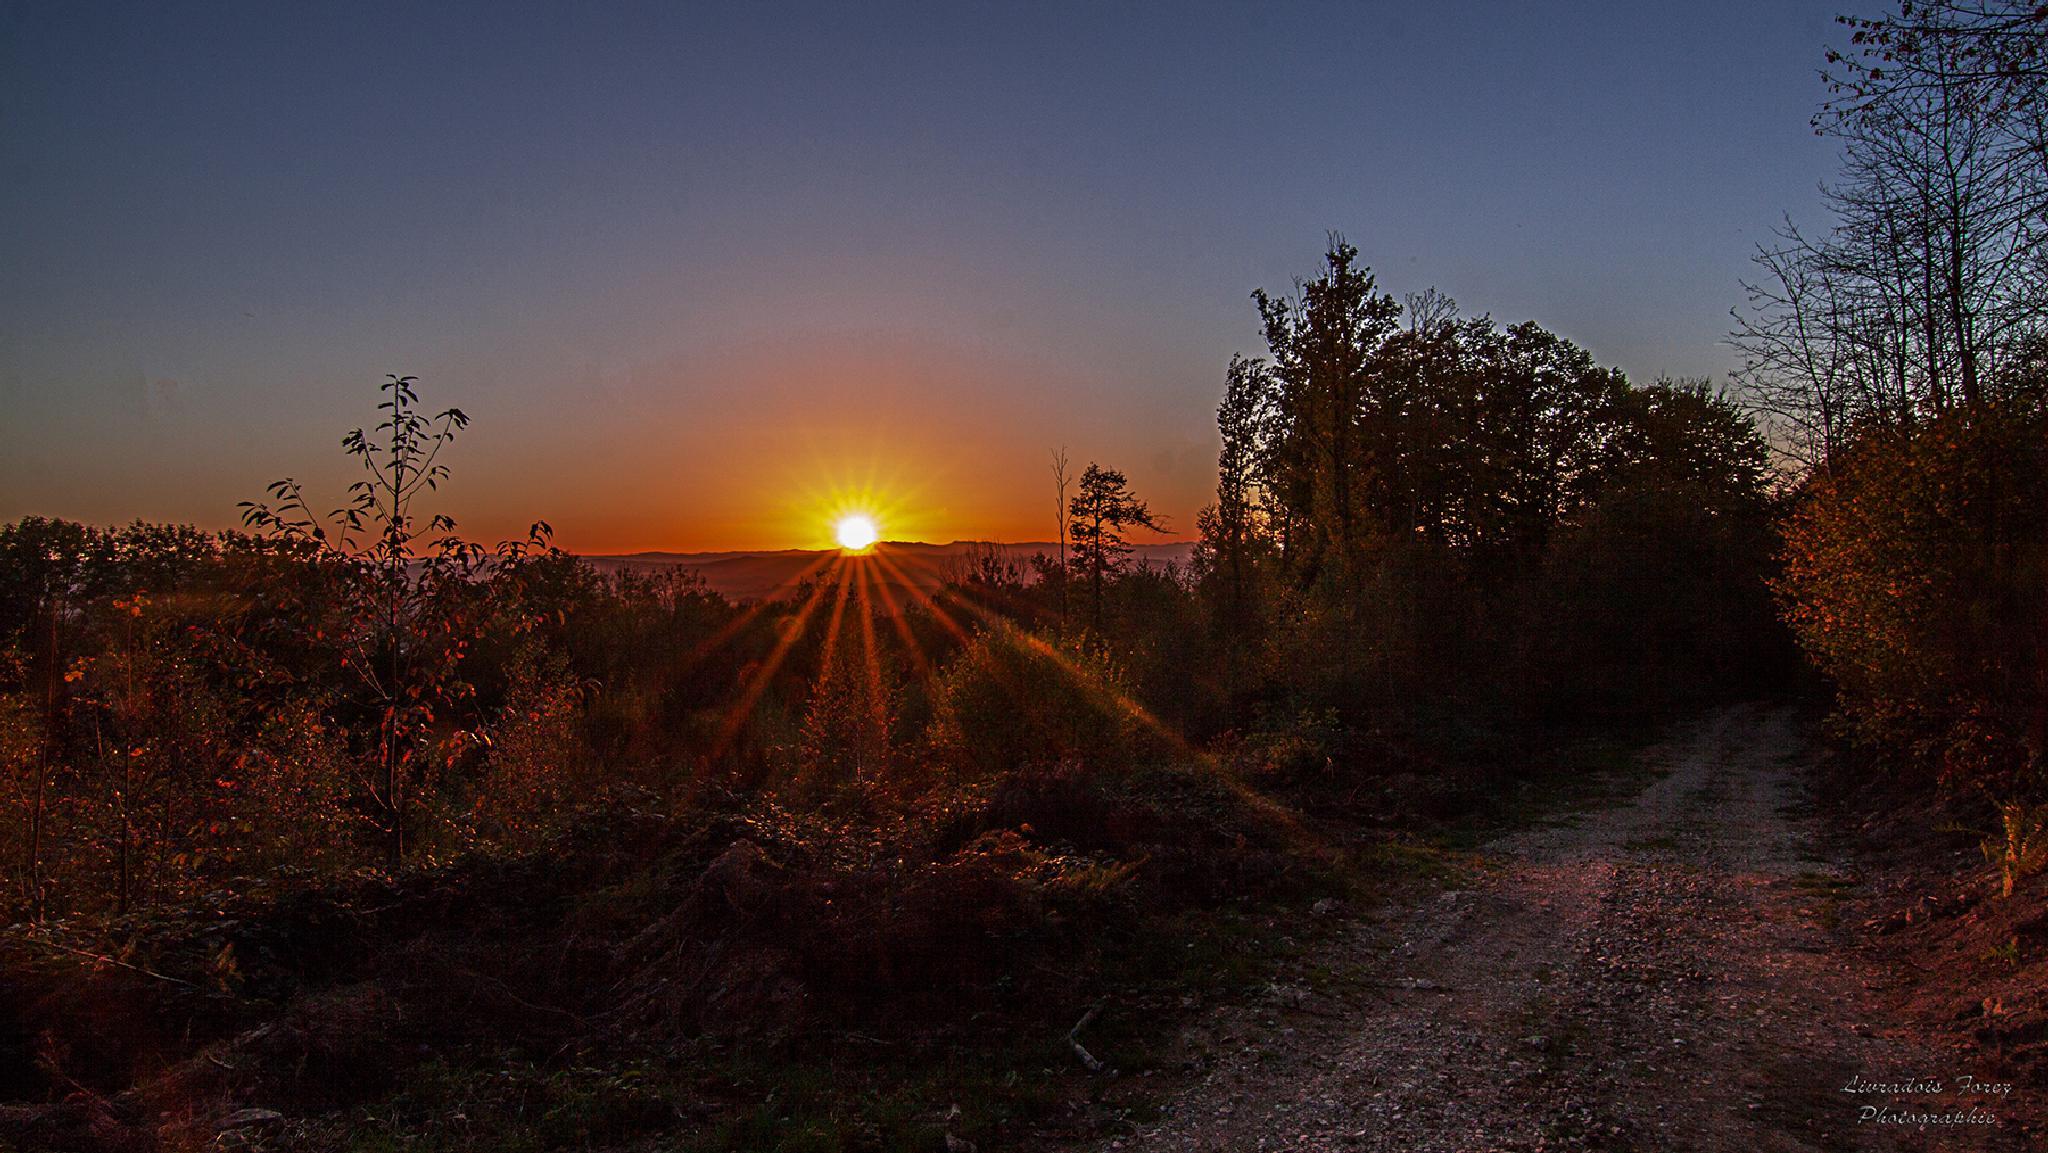 Sunset 31/10/2014 by LivradoisForezPhotographie